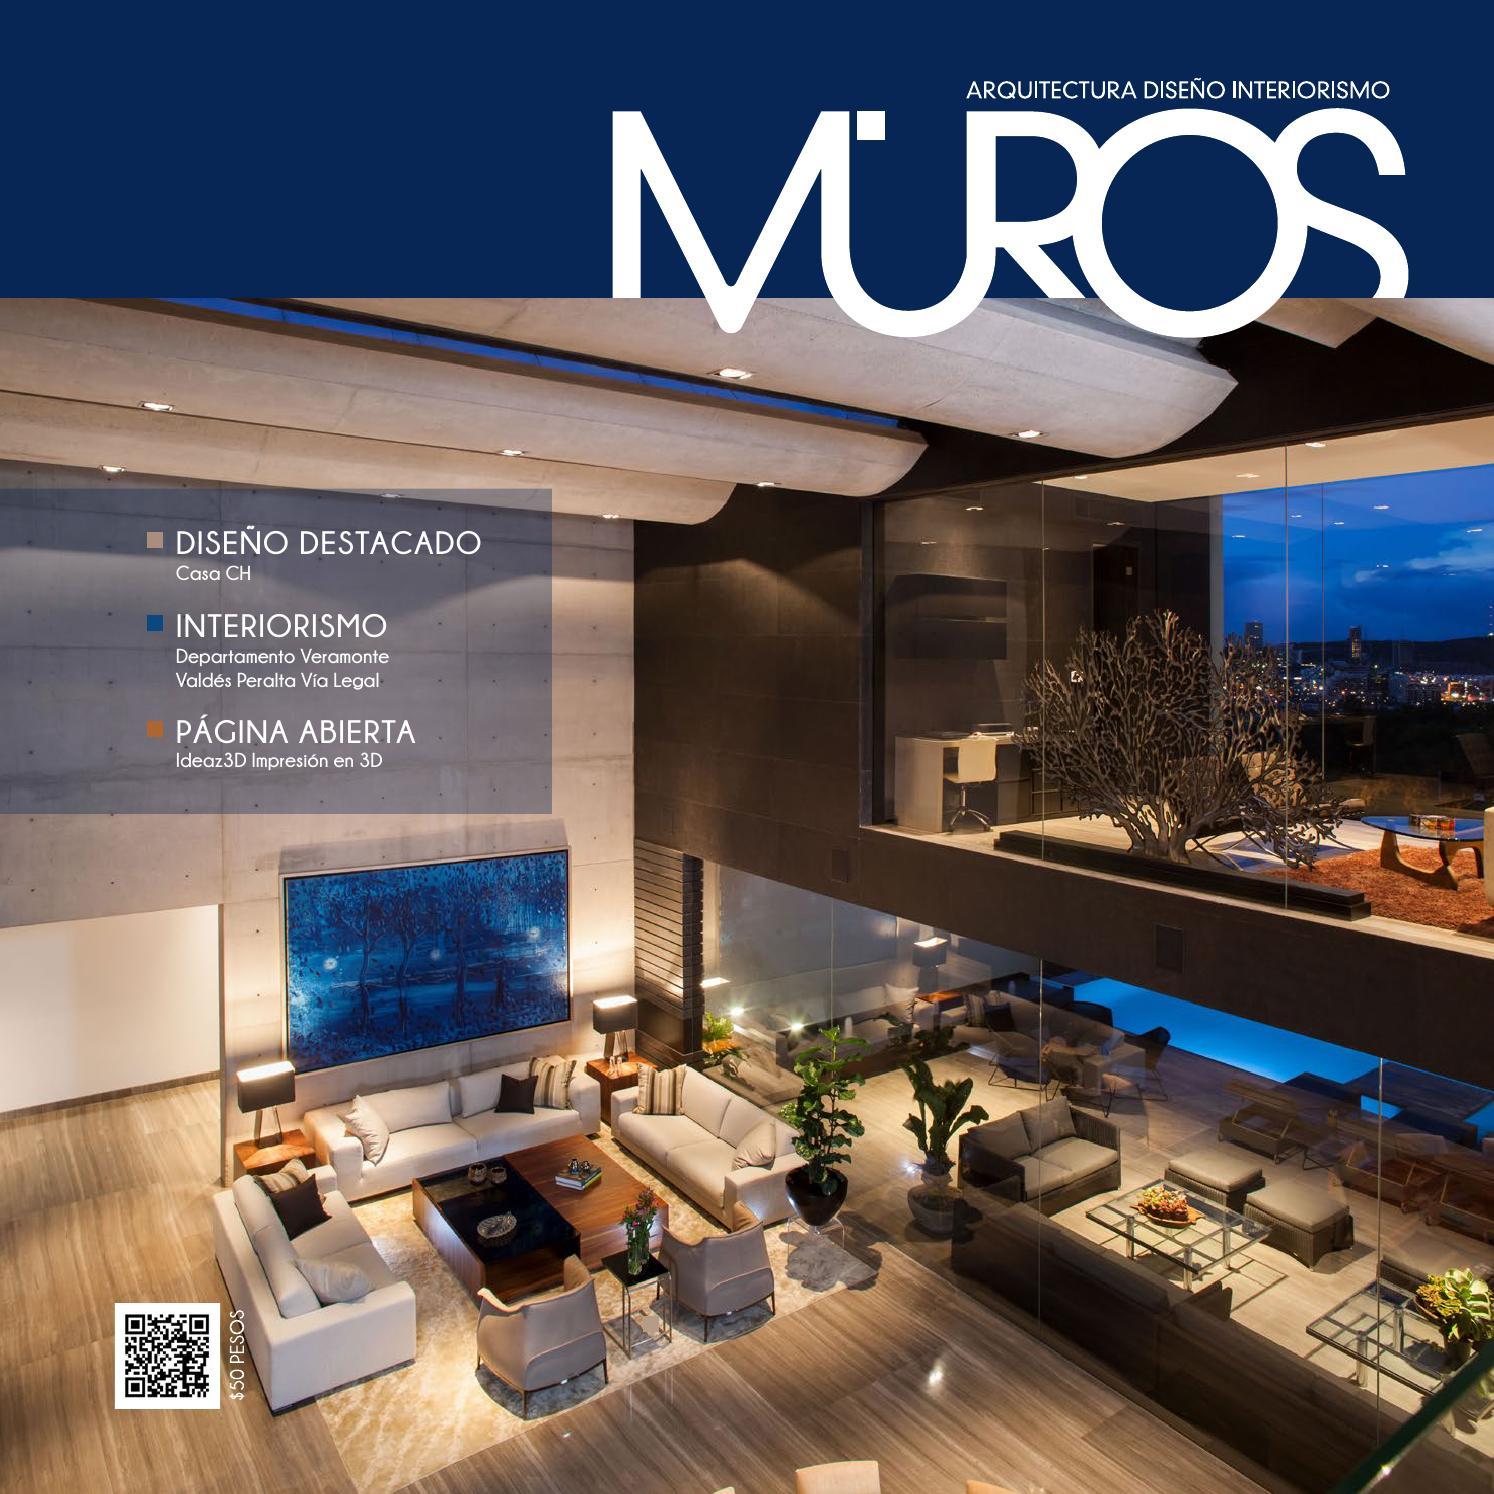 Edici n 8 revista muros arquitectura dise o interiorismo for Arte arquitectura y diseno definicion